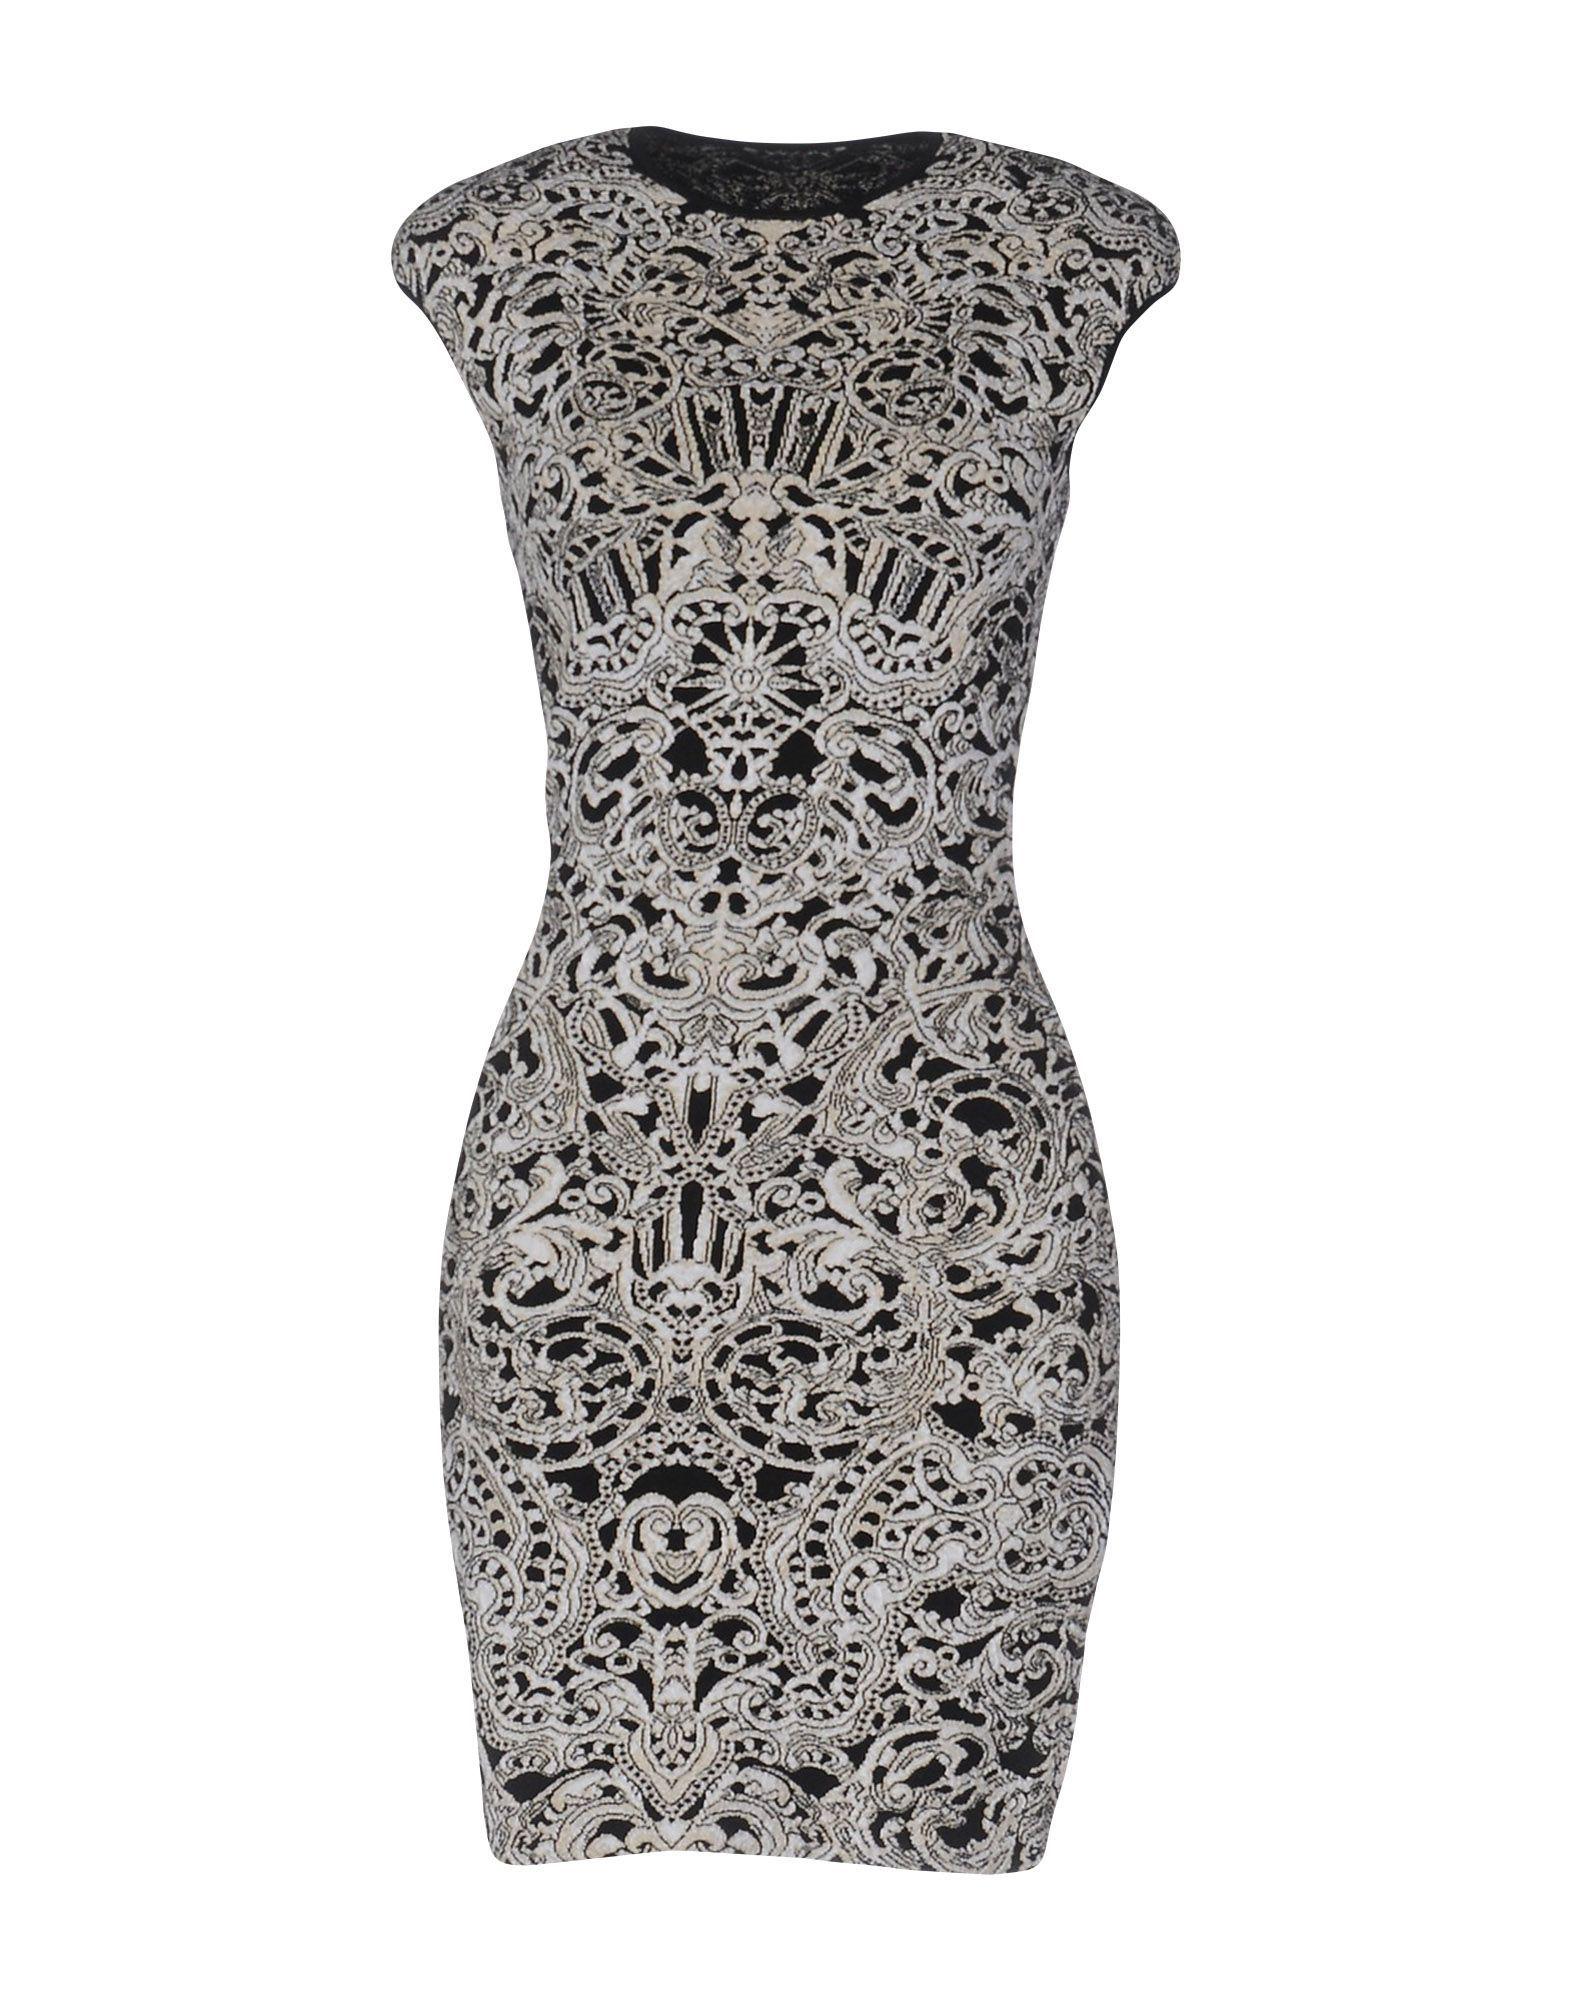 Alexander mcqueen women short dress on yoox the best online